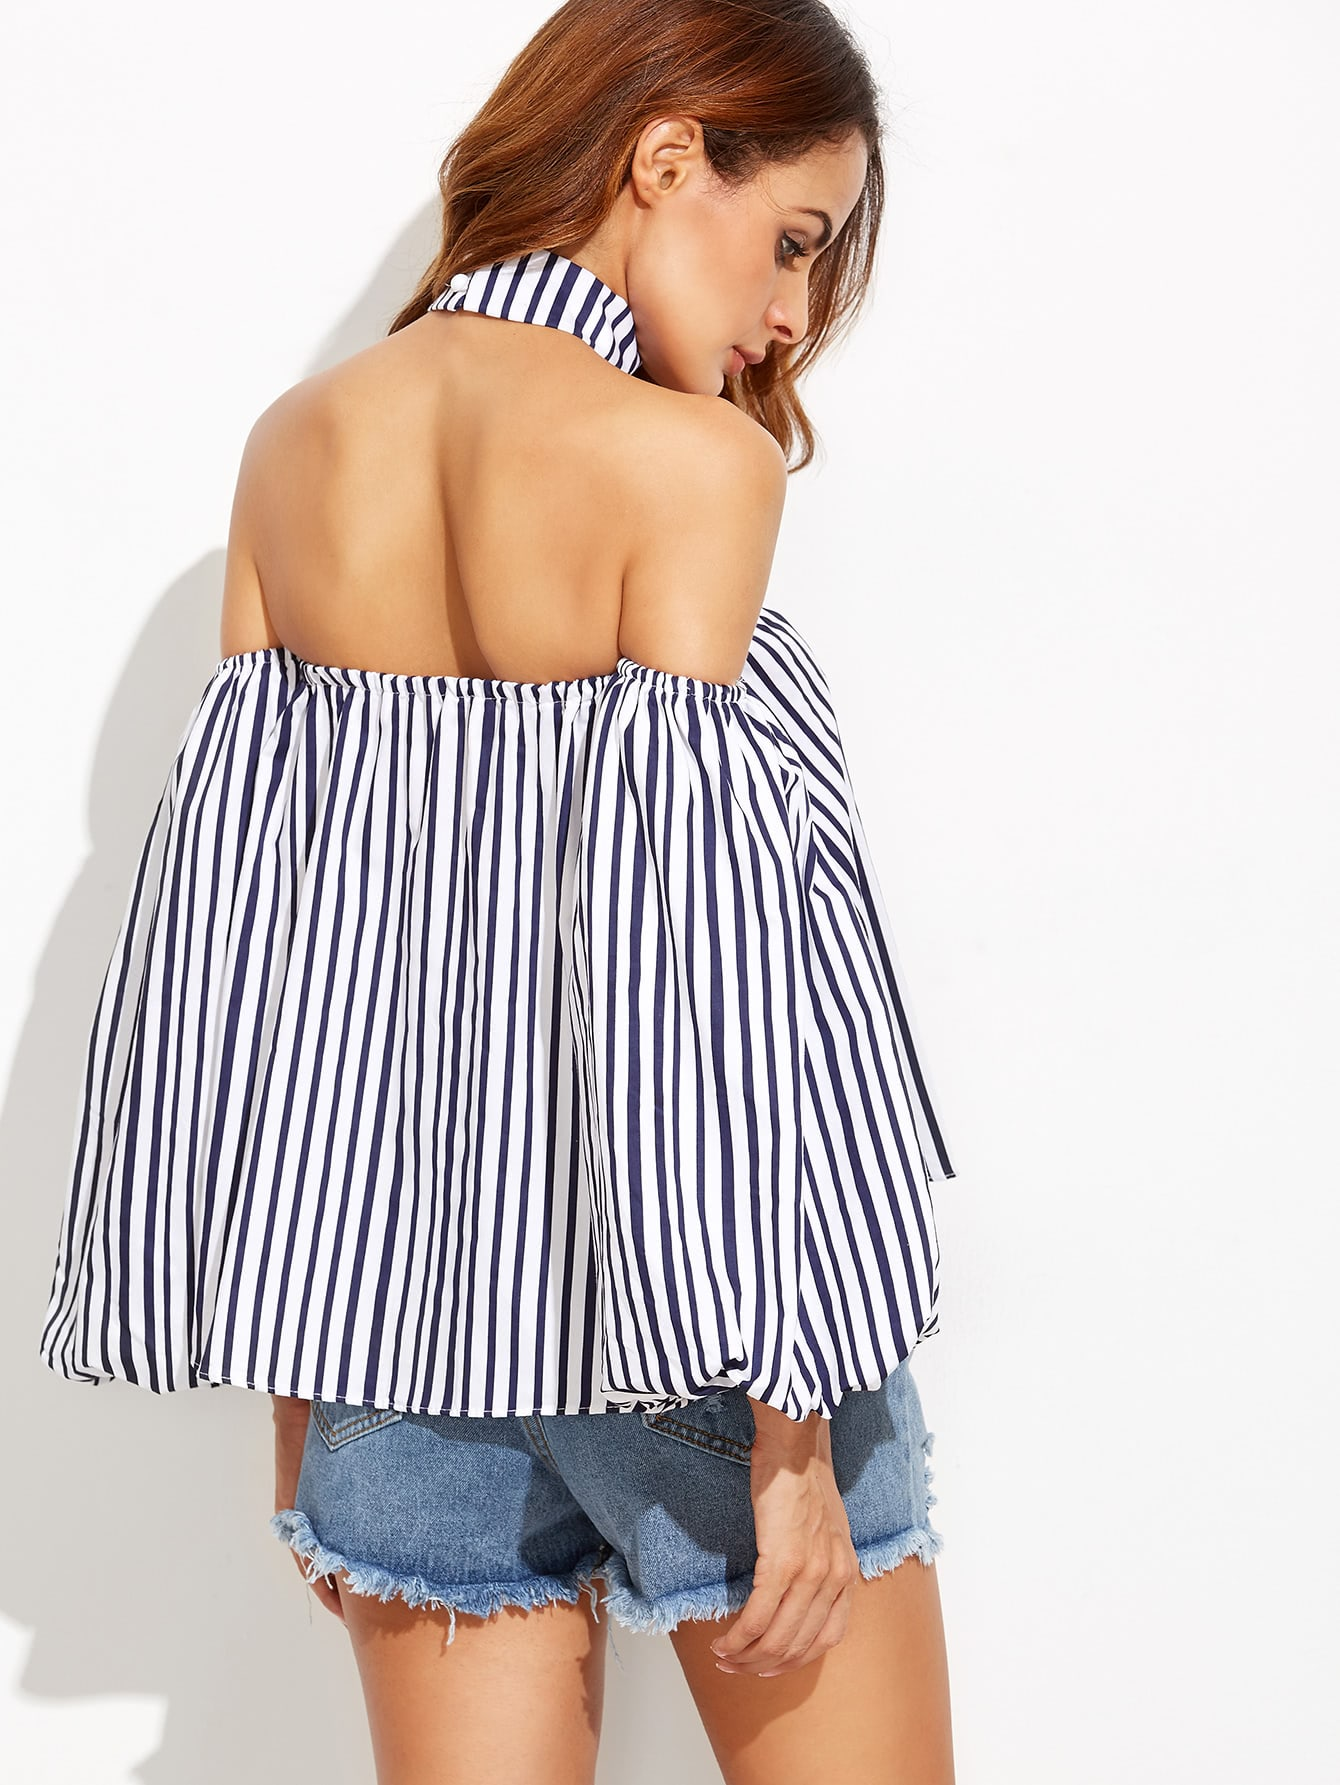 blouse160808102_2